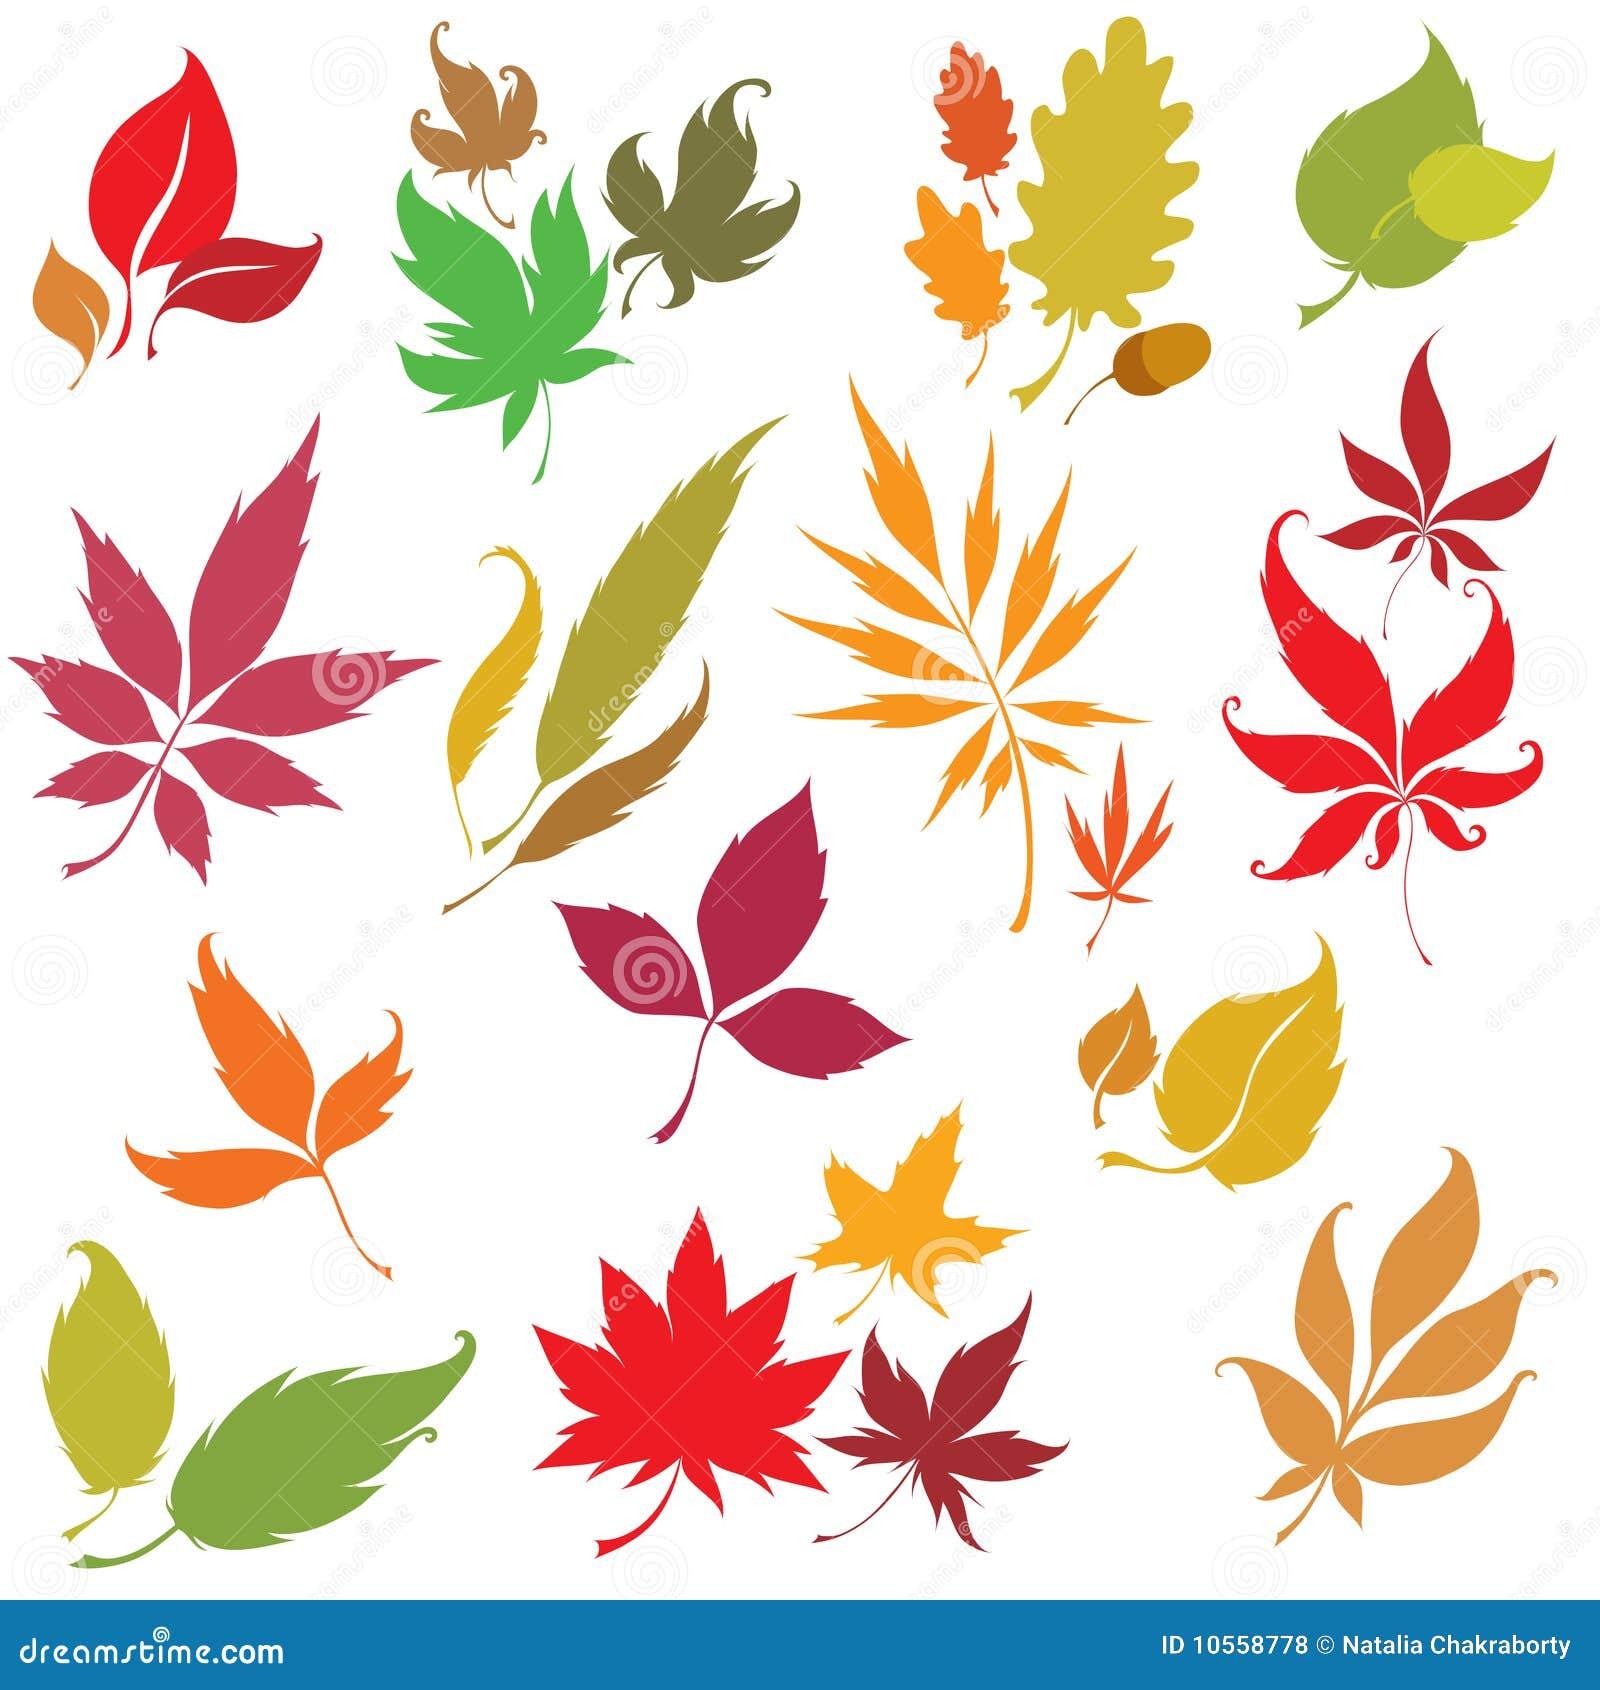 Set of autumn leaves design elements